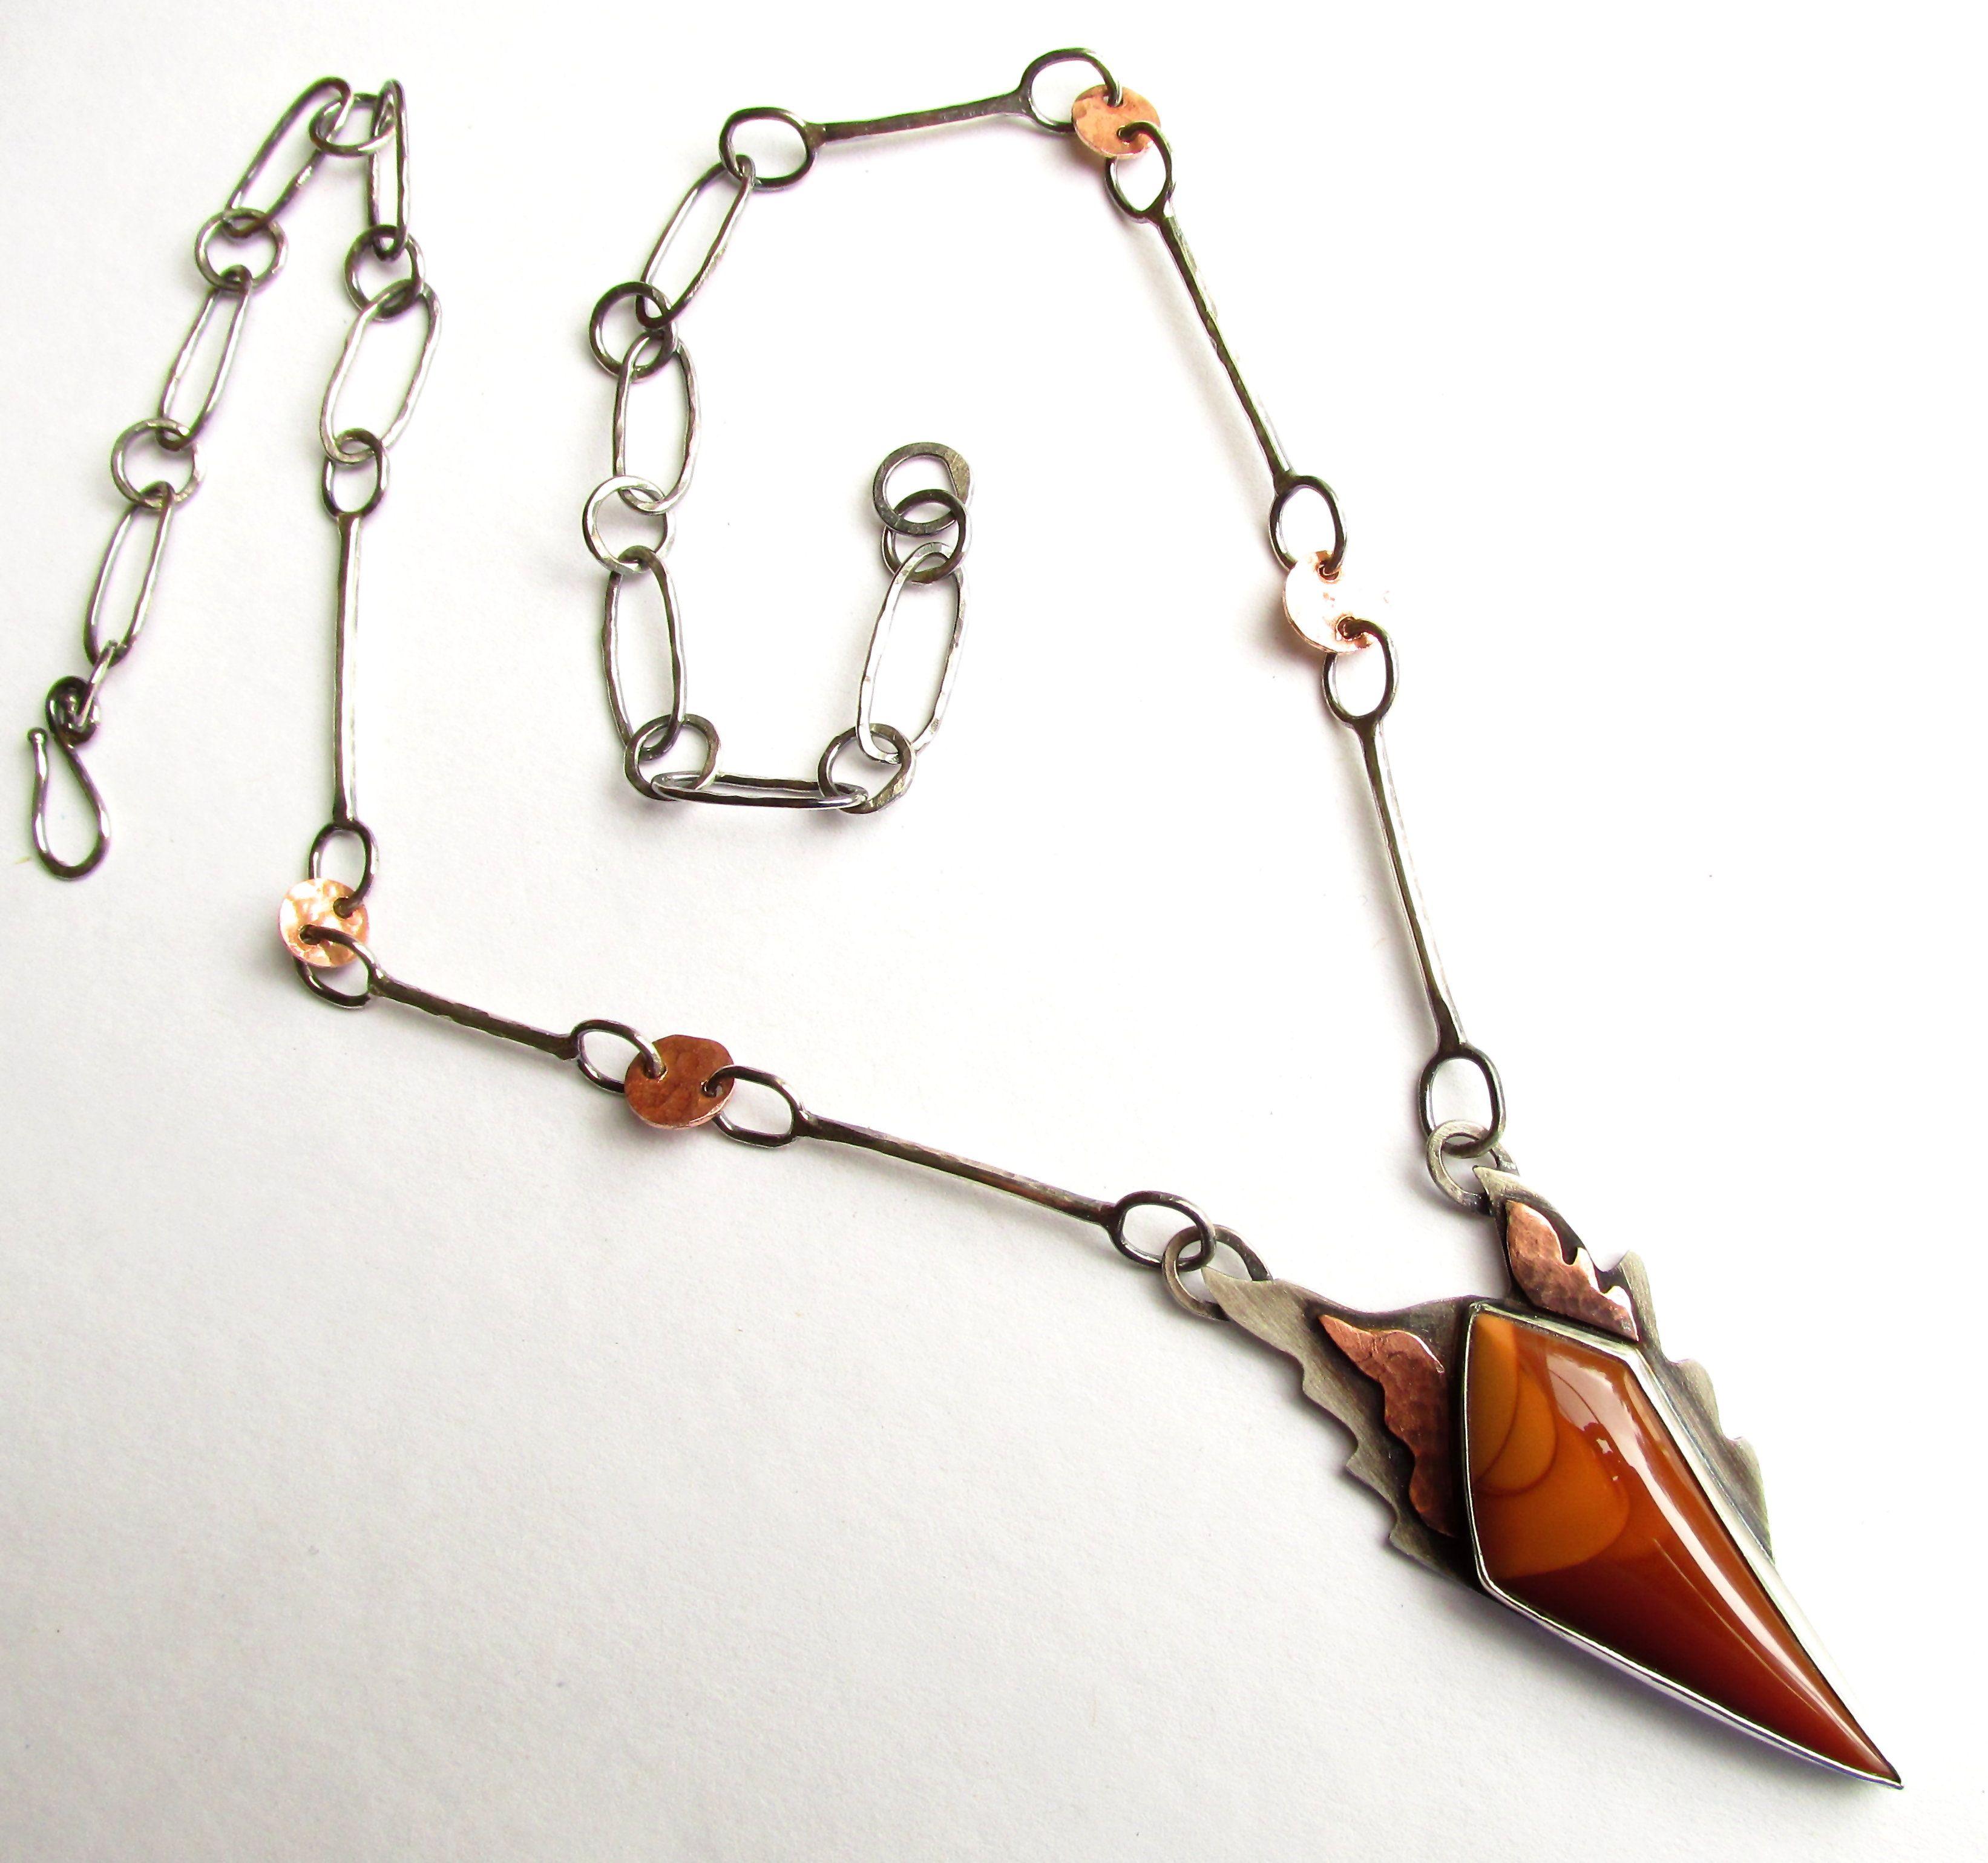 Tree of Life - Sterling Silver - Copper - Necklace Pendant - Bruneau Jasper  metalsmith www.rmddesigns.com